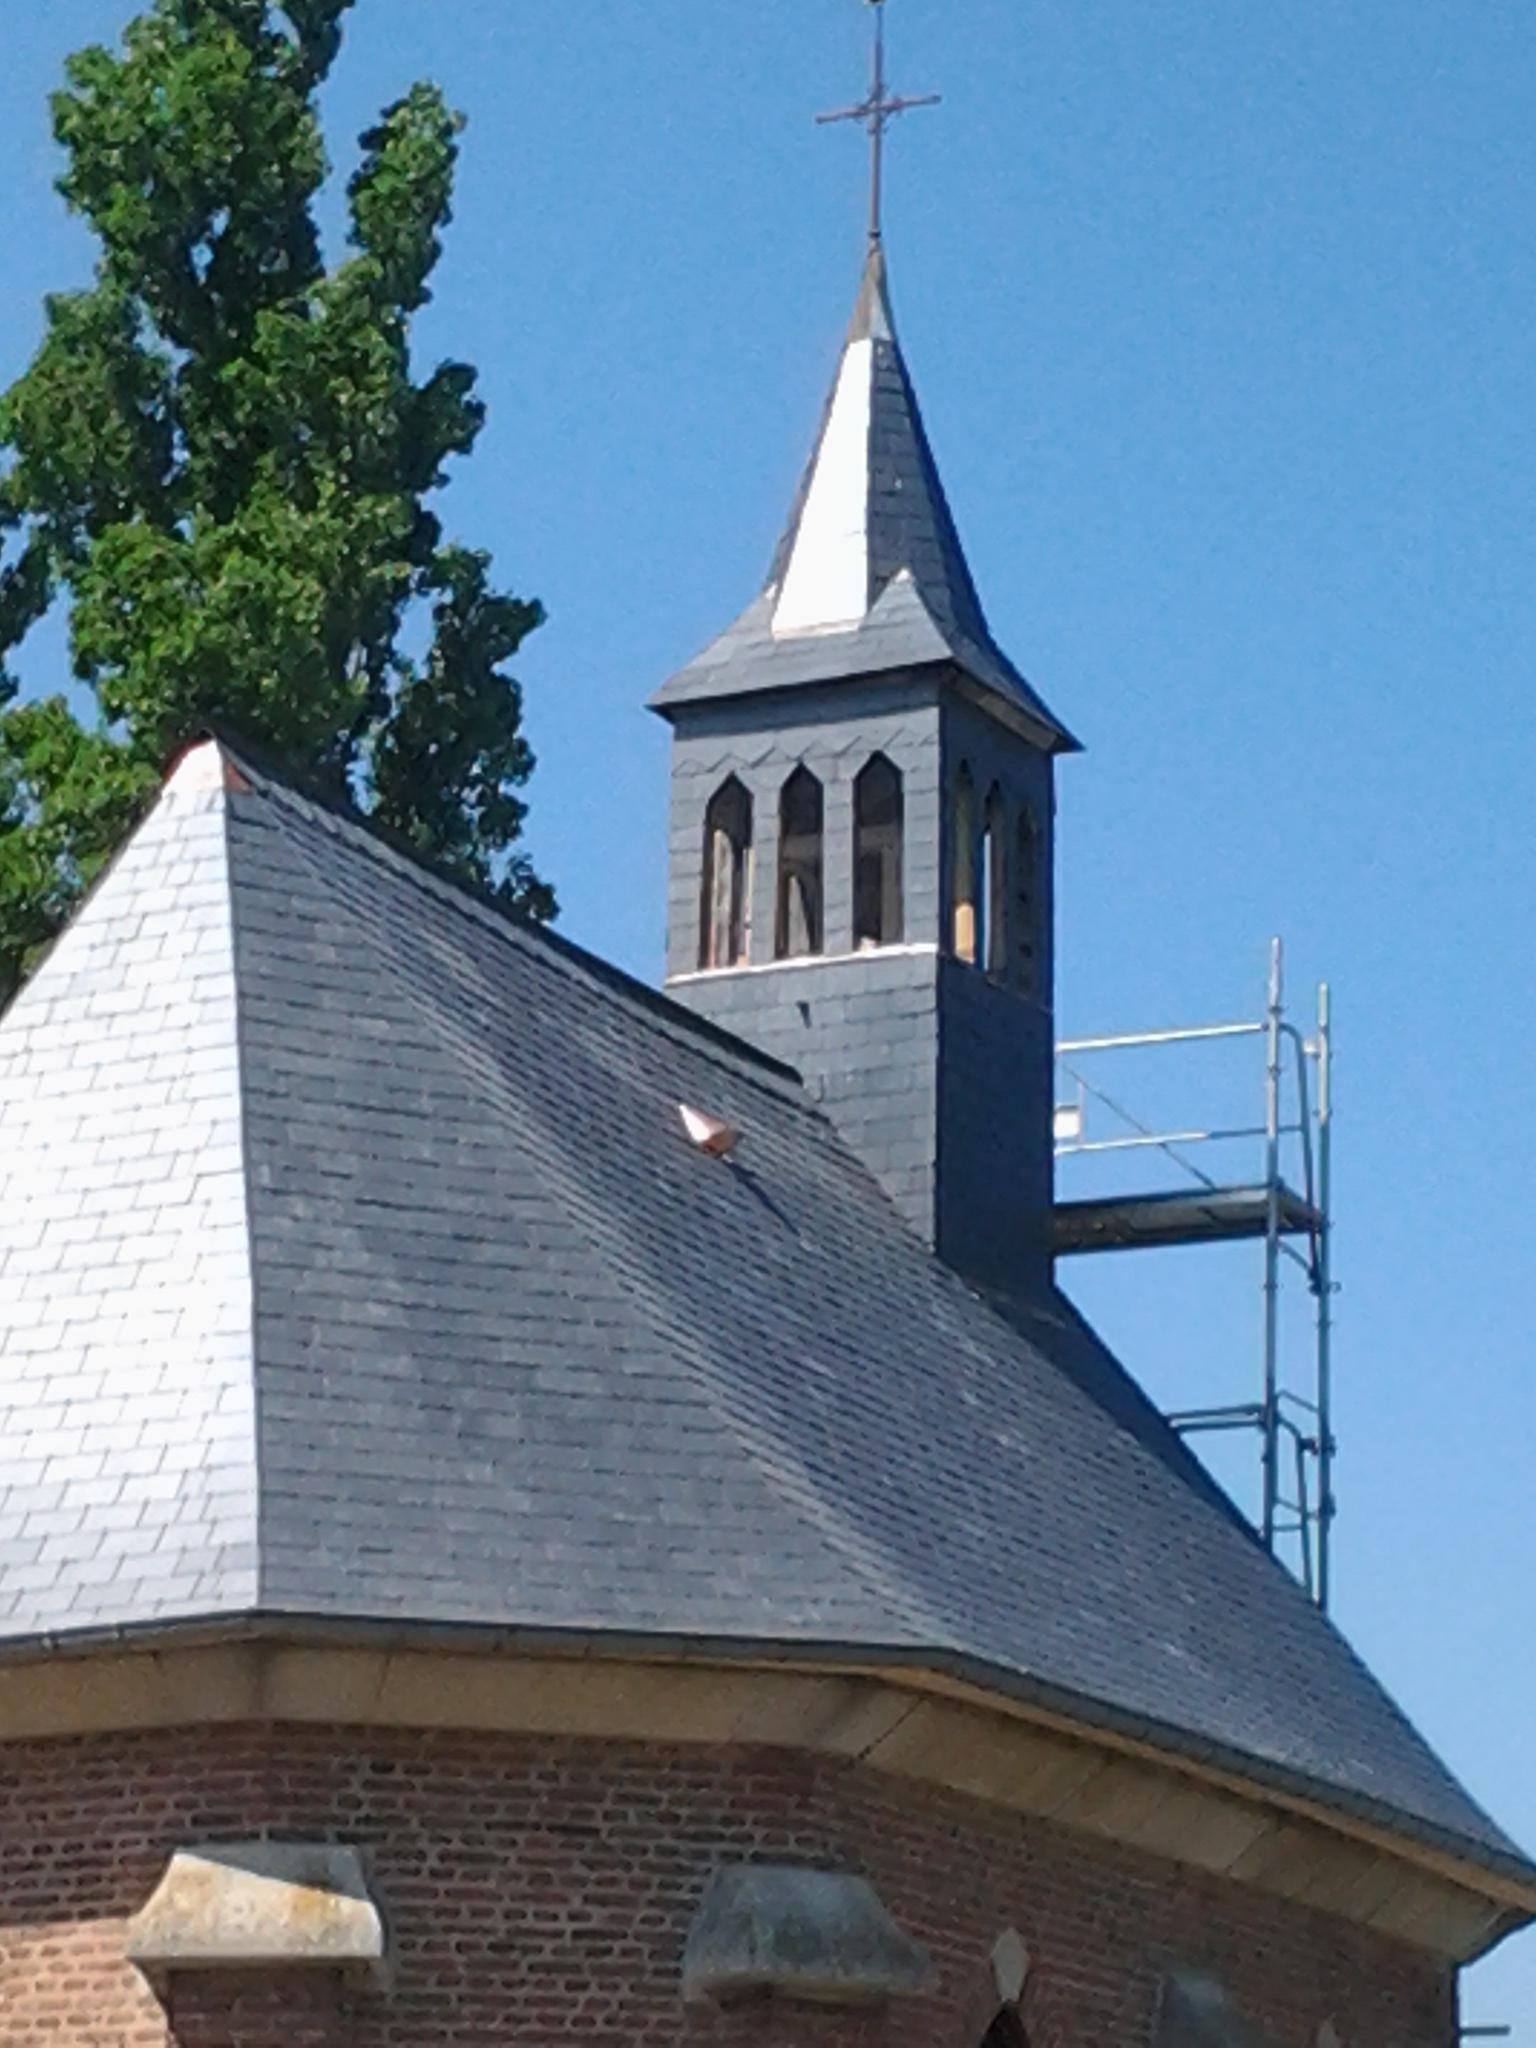 chapelle-en-ardoise-Angers